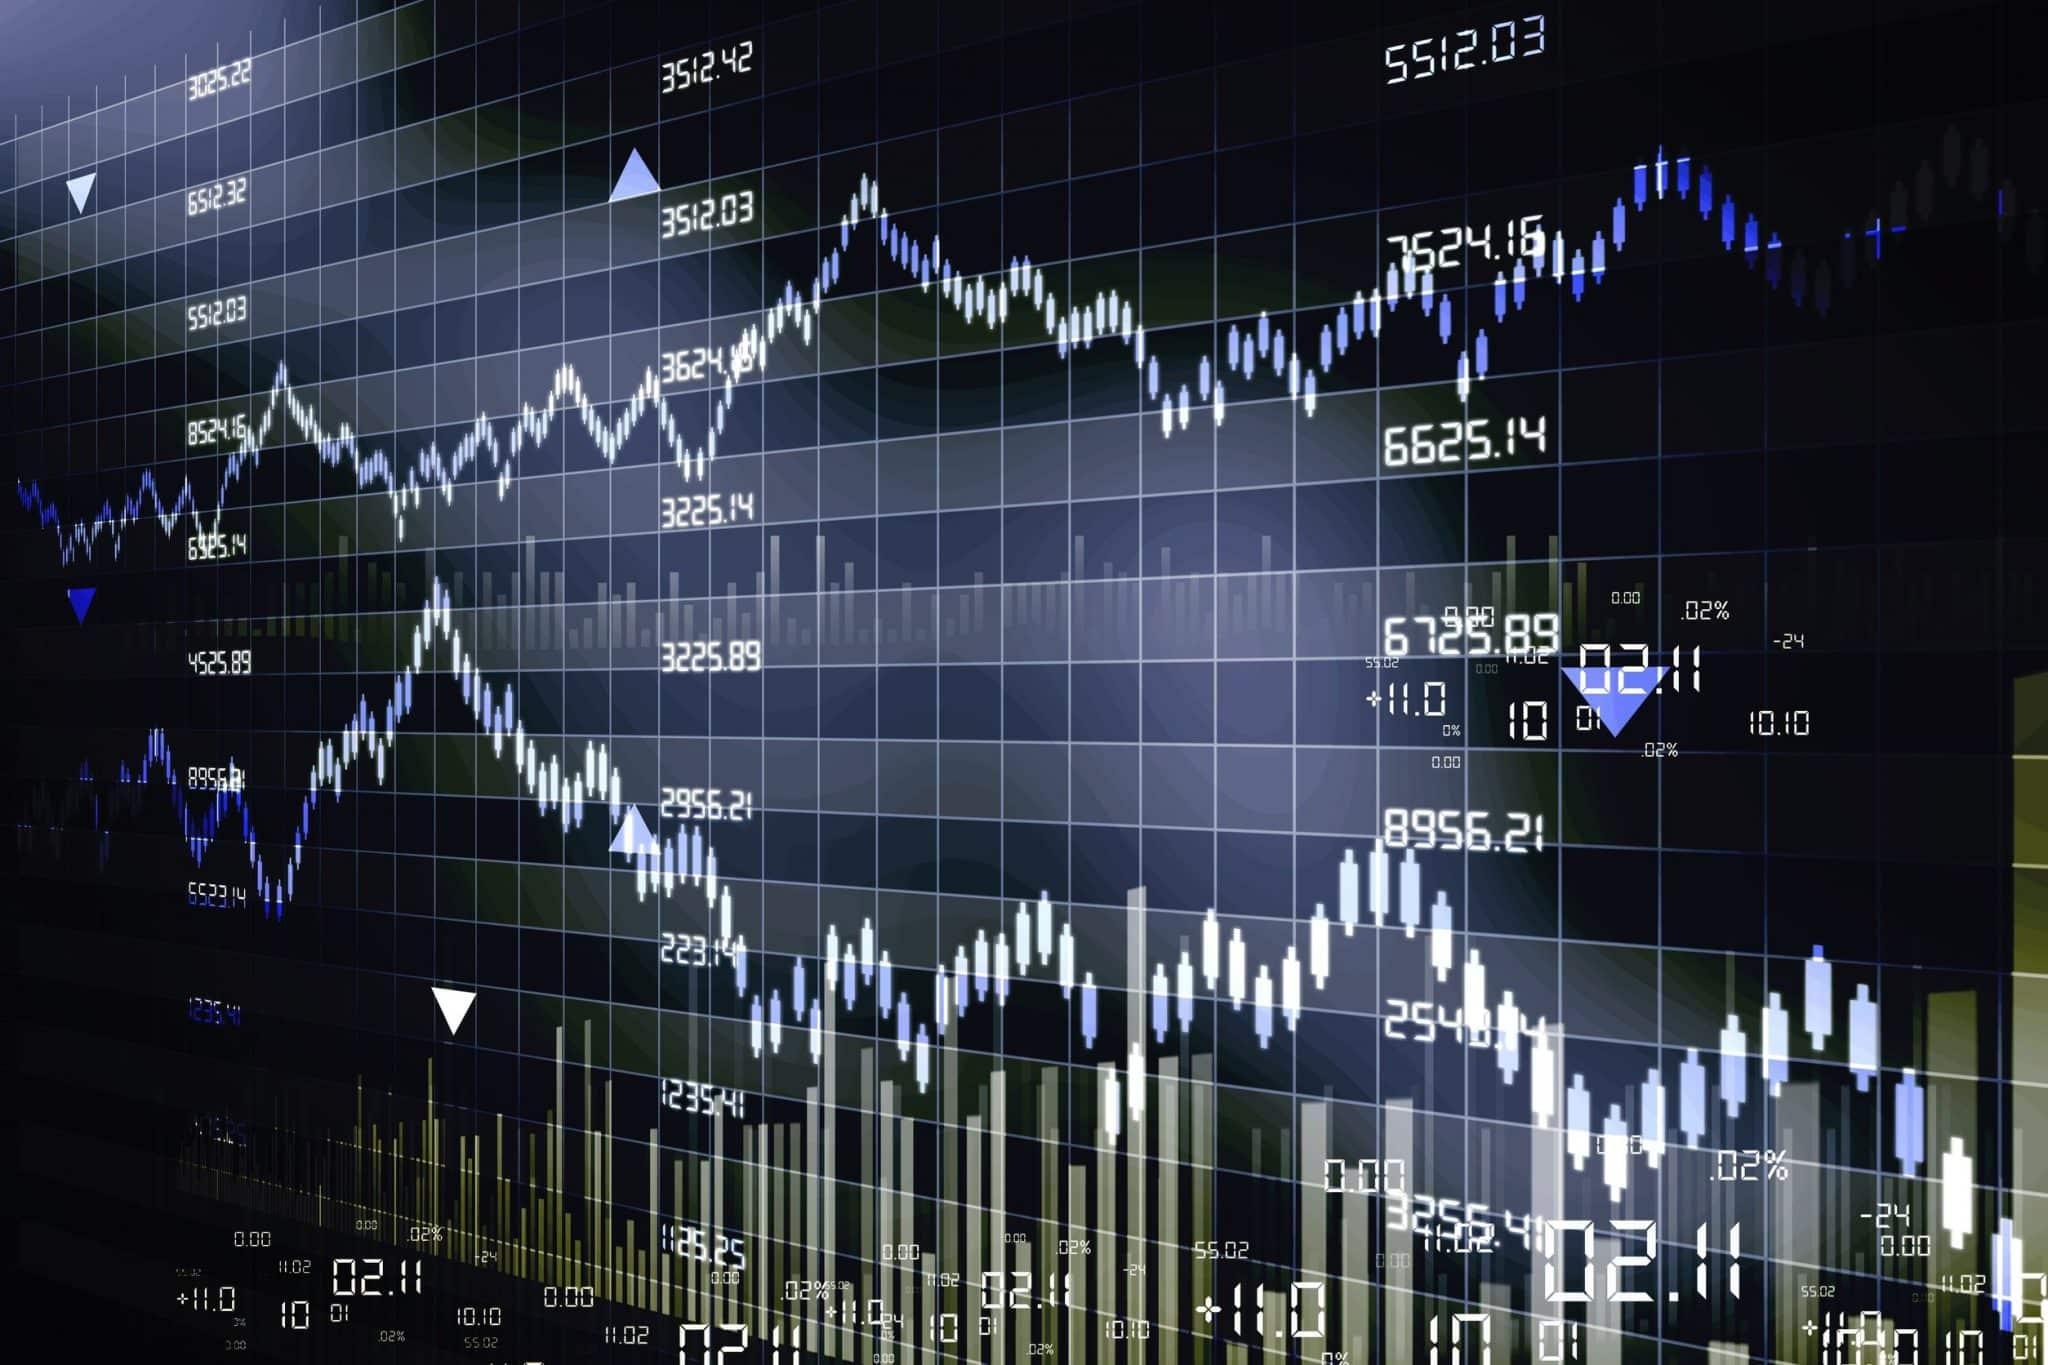 The Volatile Cryptomarket